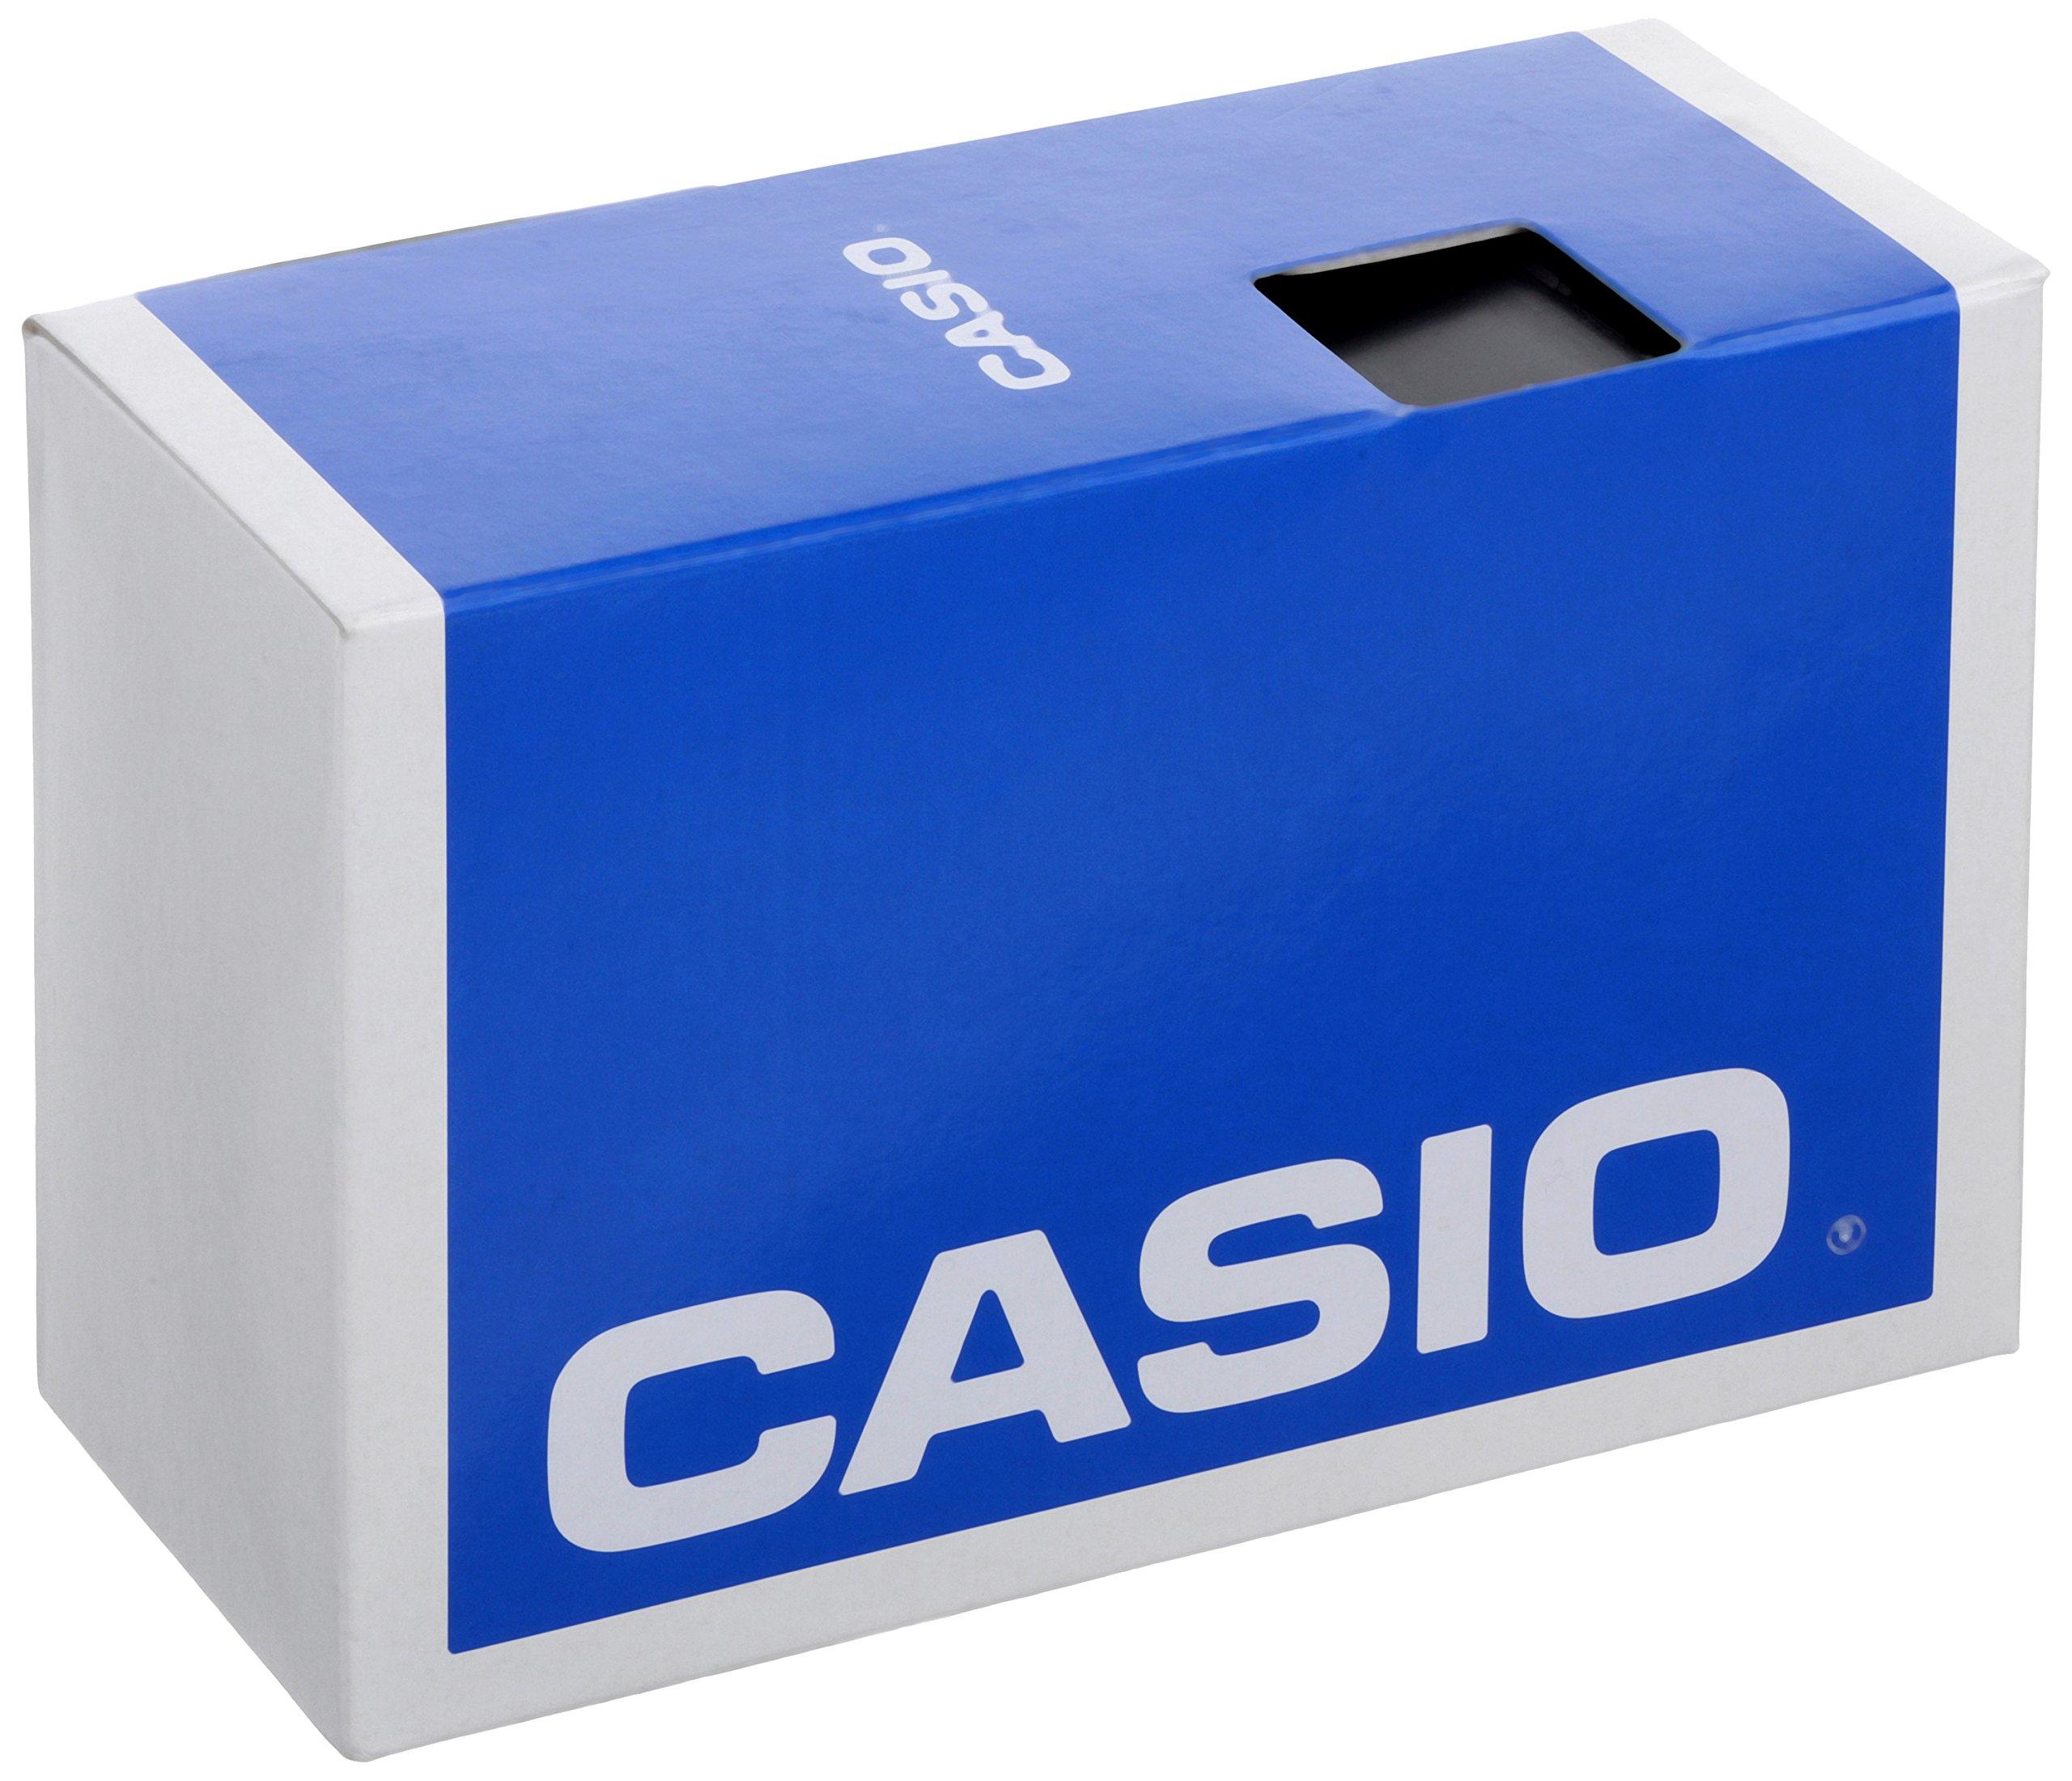 Casio Women's STL-S300H-1ACF Solar Runner Digital Display Quartz Black Watch by Casio (Image #3)